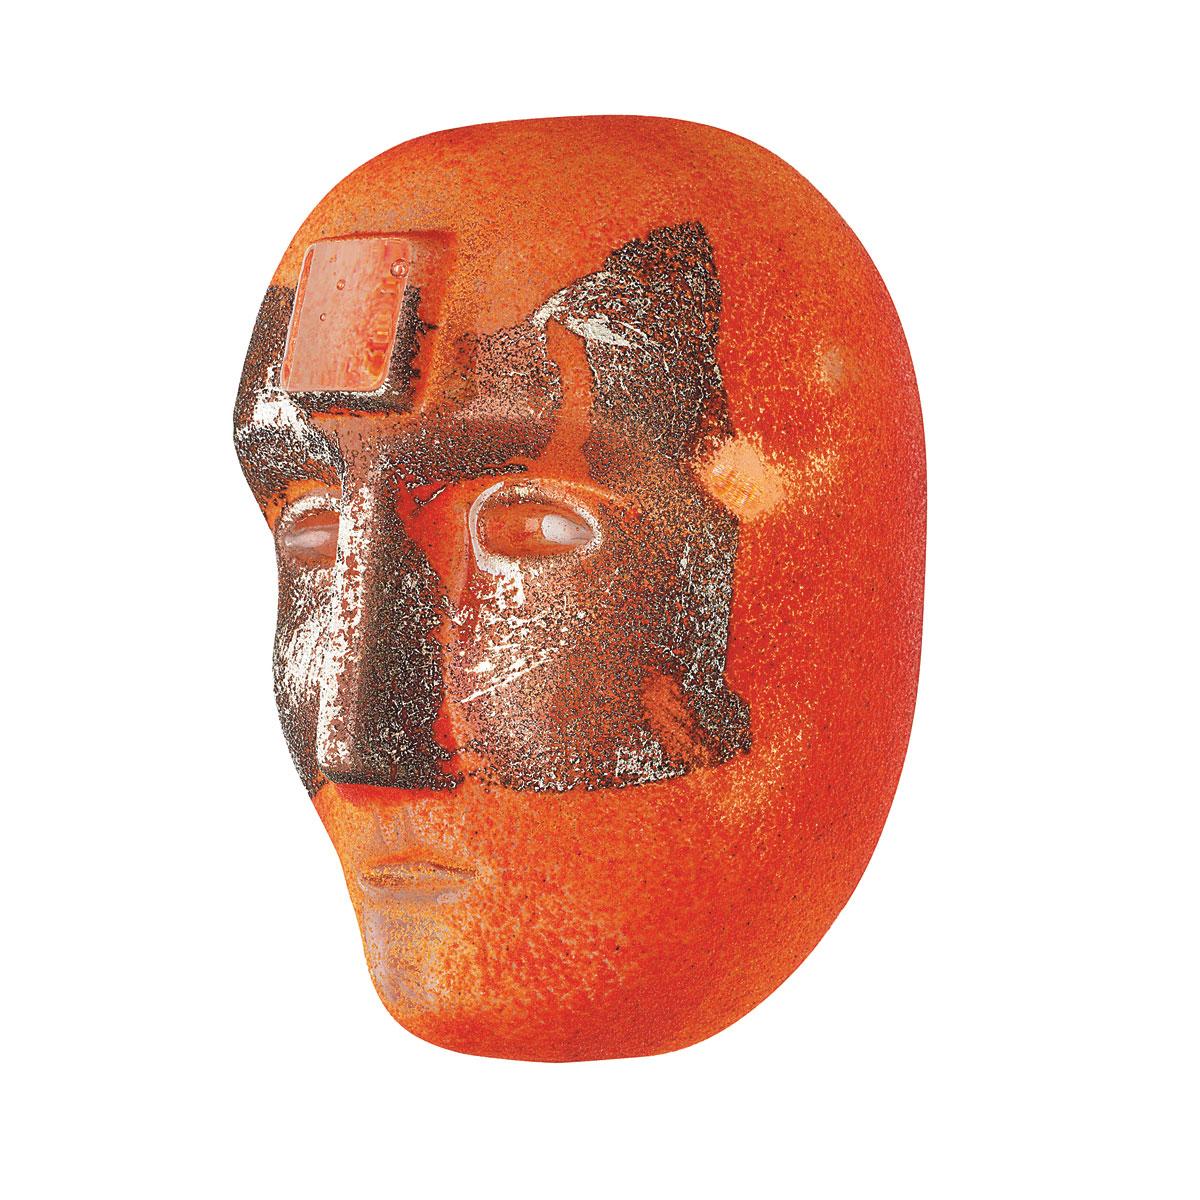 Kosta Boda Art Glass Bertil Vallien Look In Orange, Limited Edition